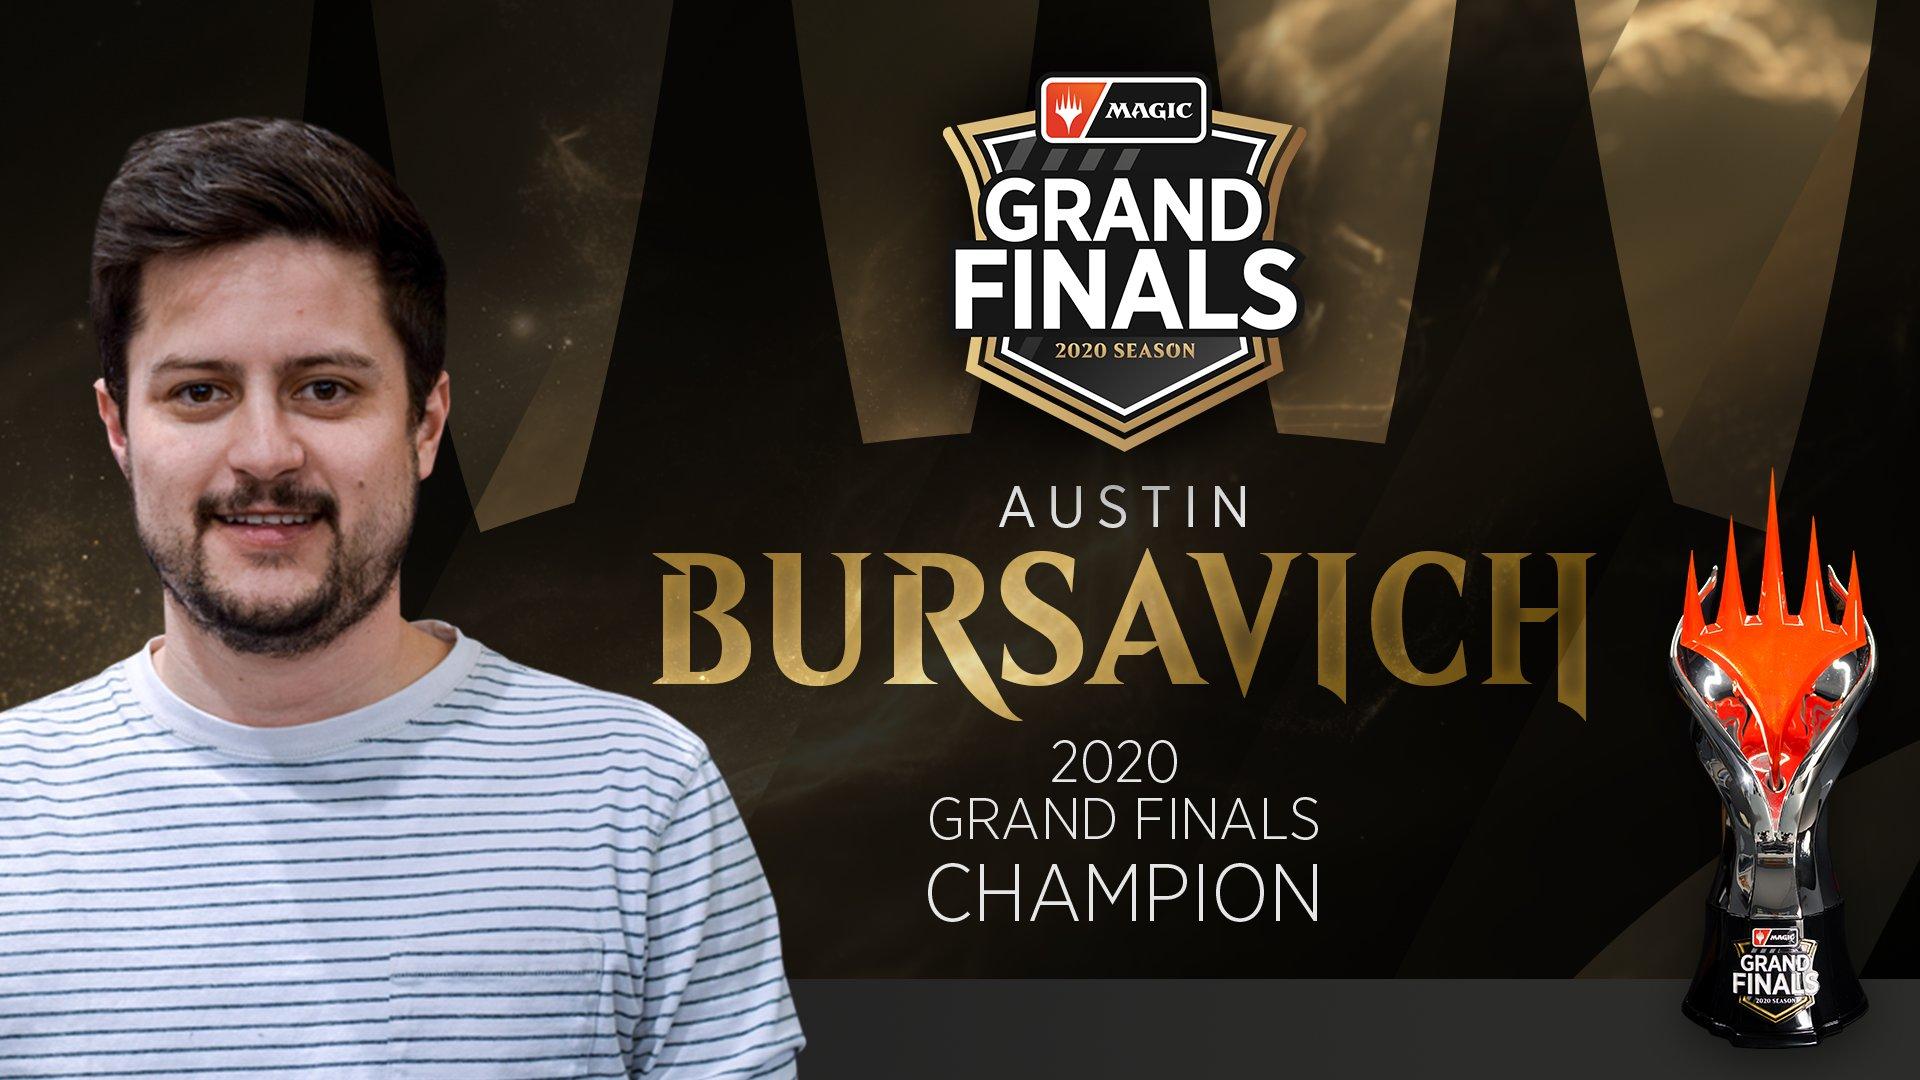 Austin Bursavich Campeão Grand Finals